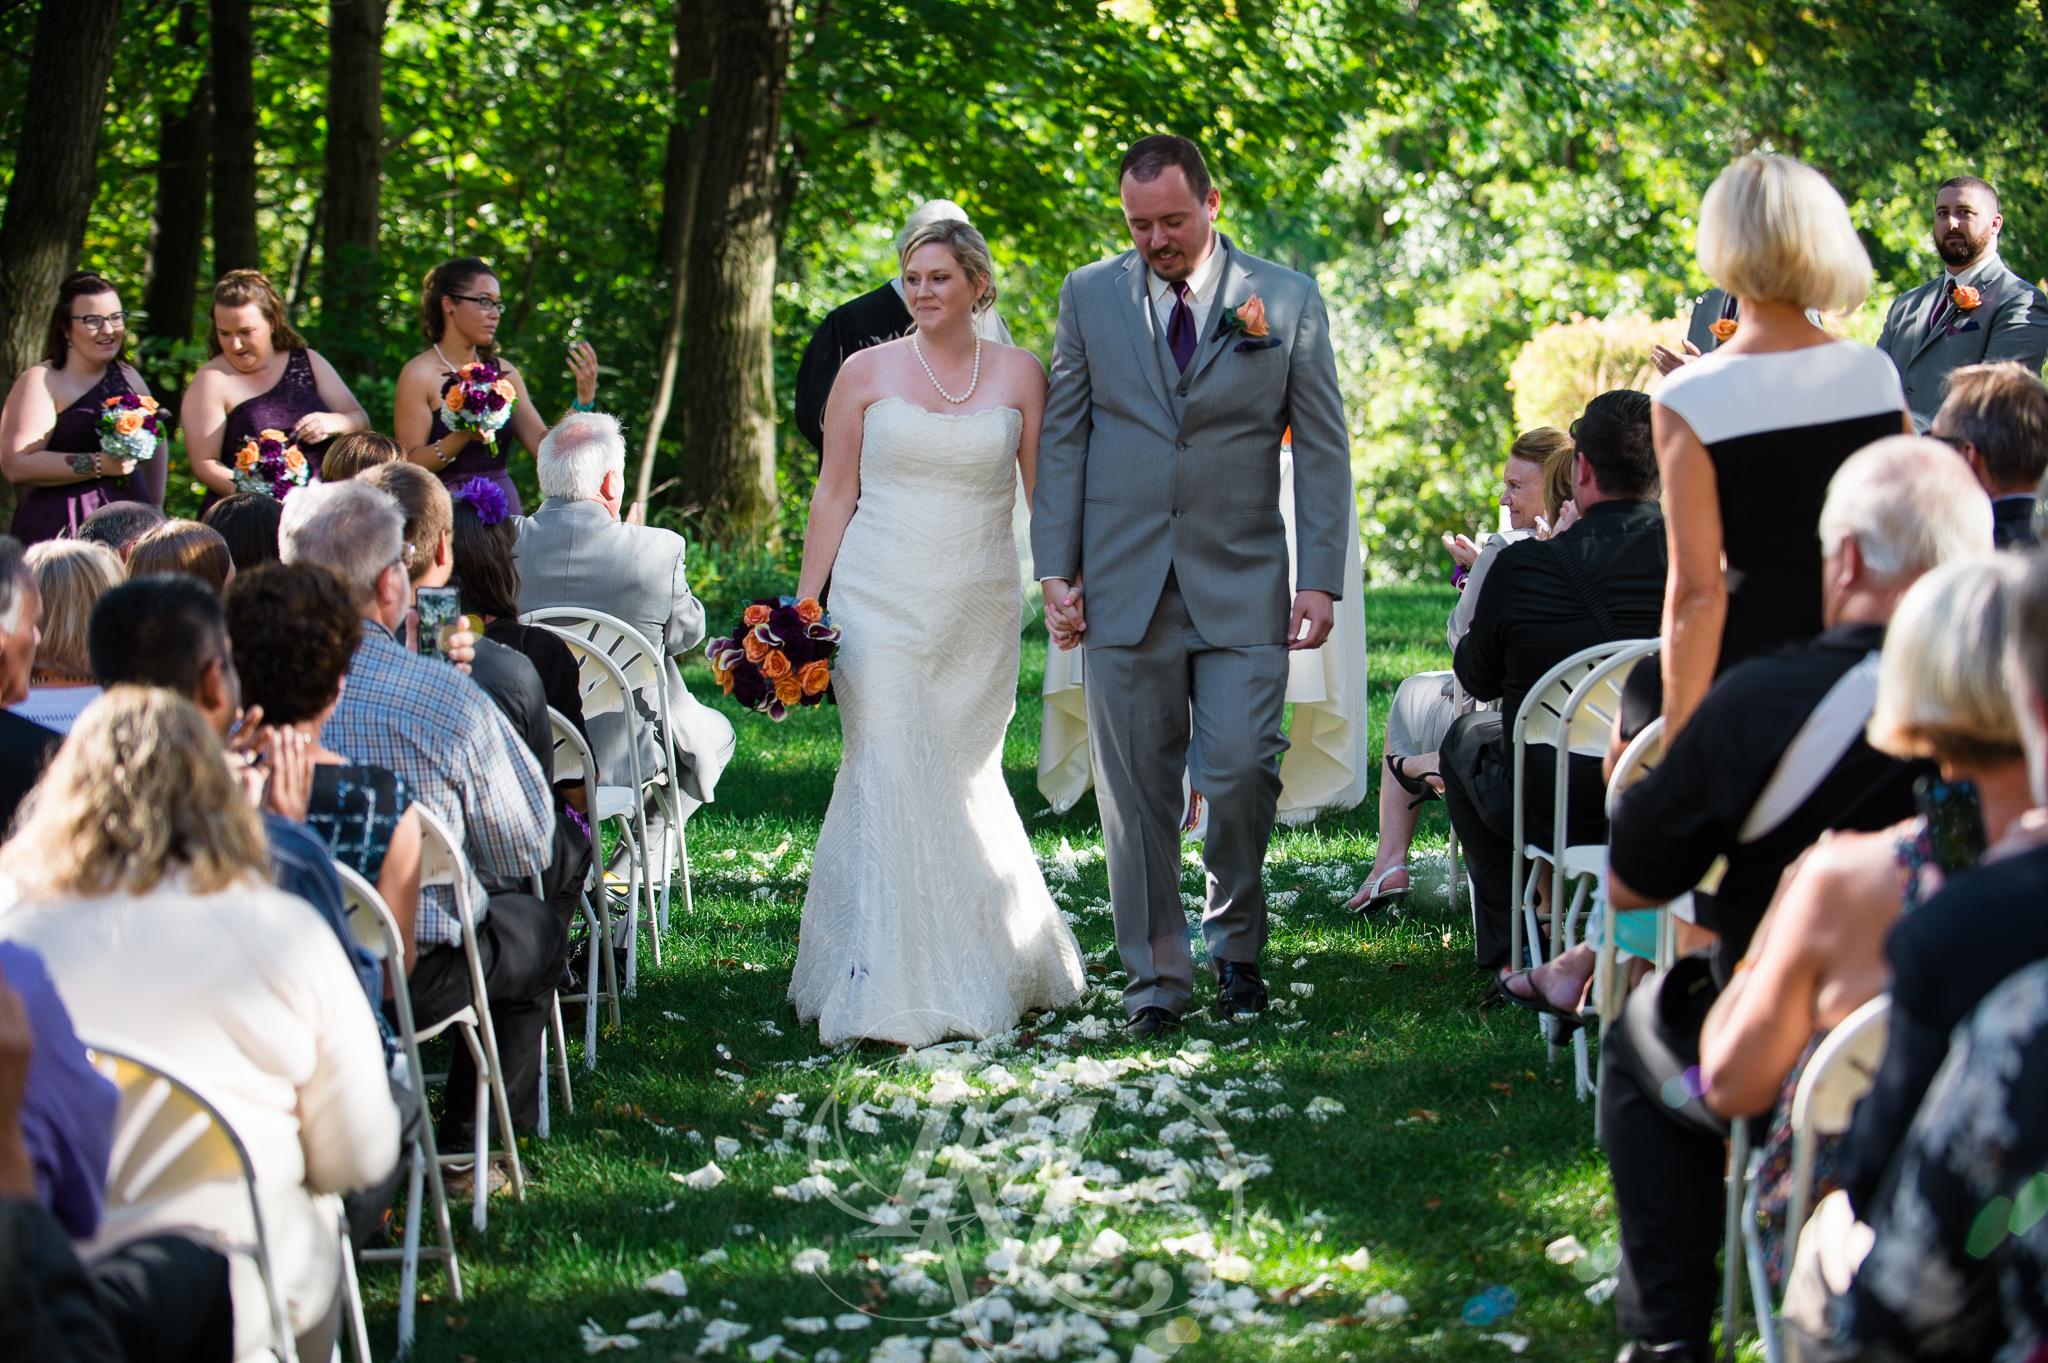 Jackie & Corey - Minnesota Wedding Photography - RKH Images -16.jpg